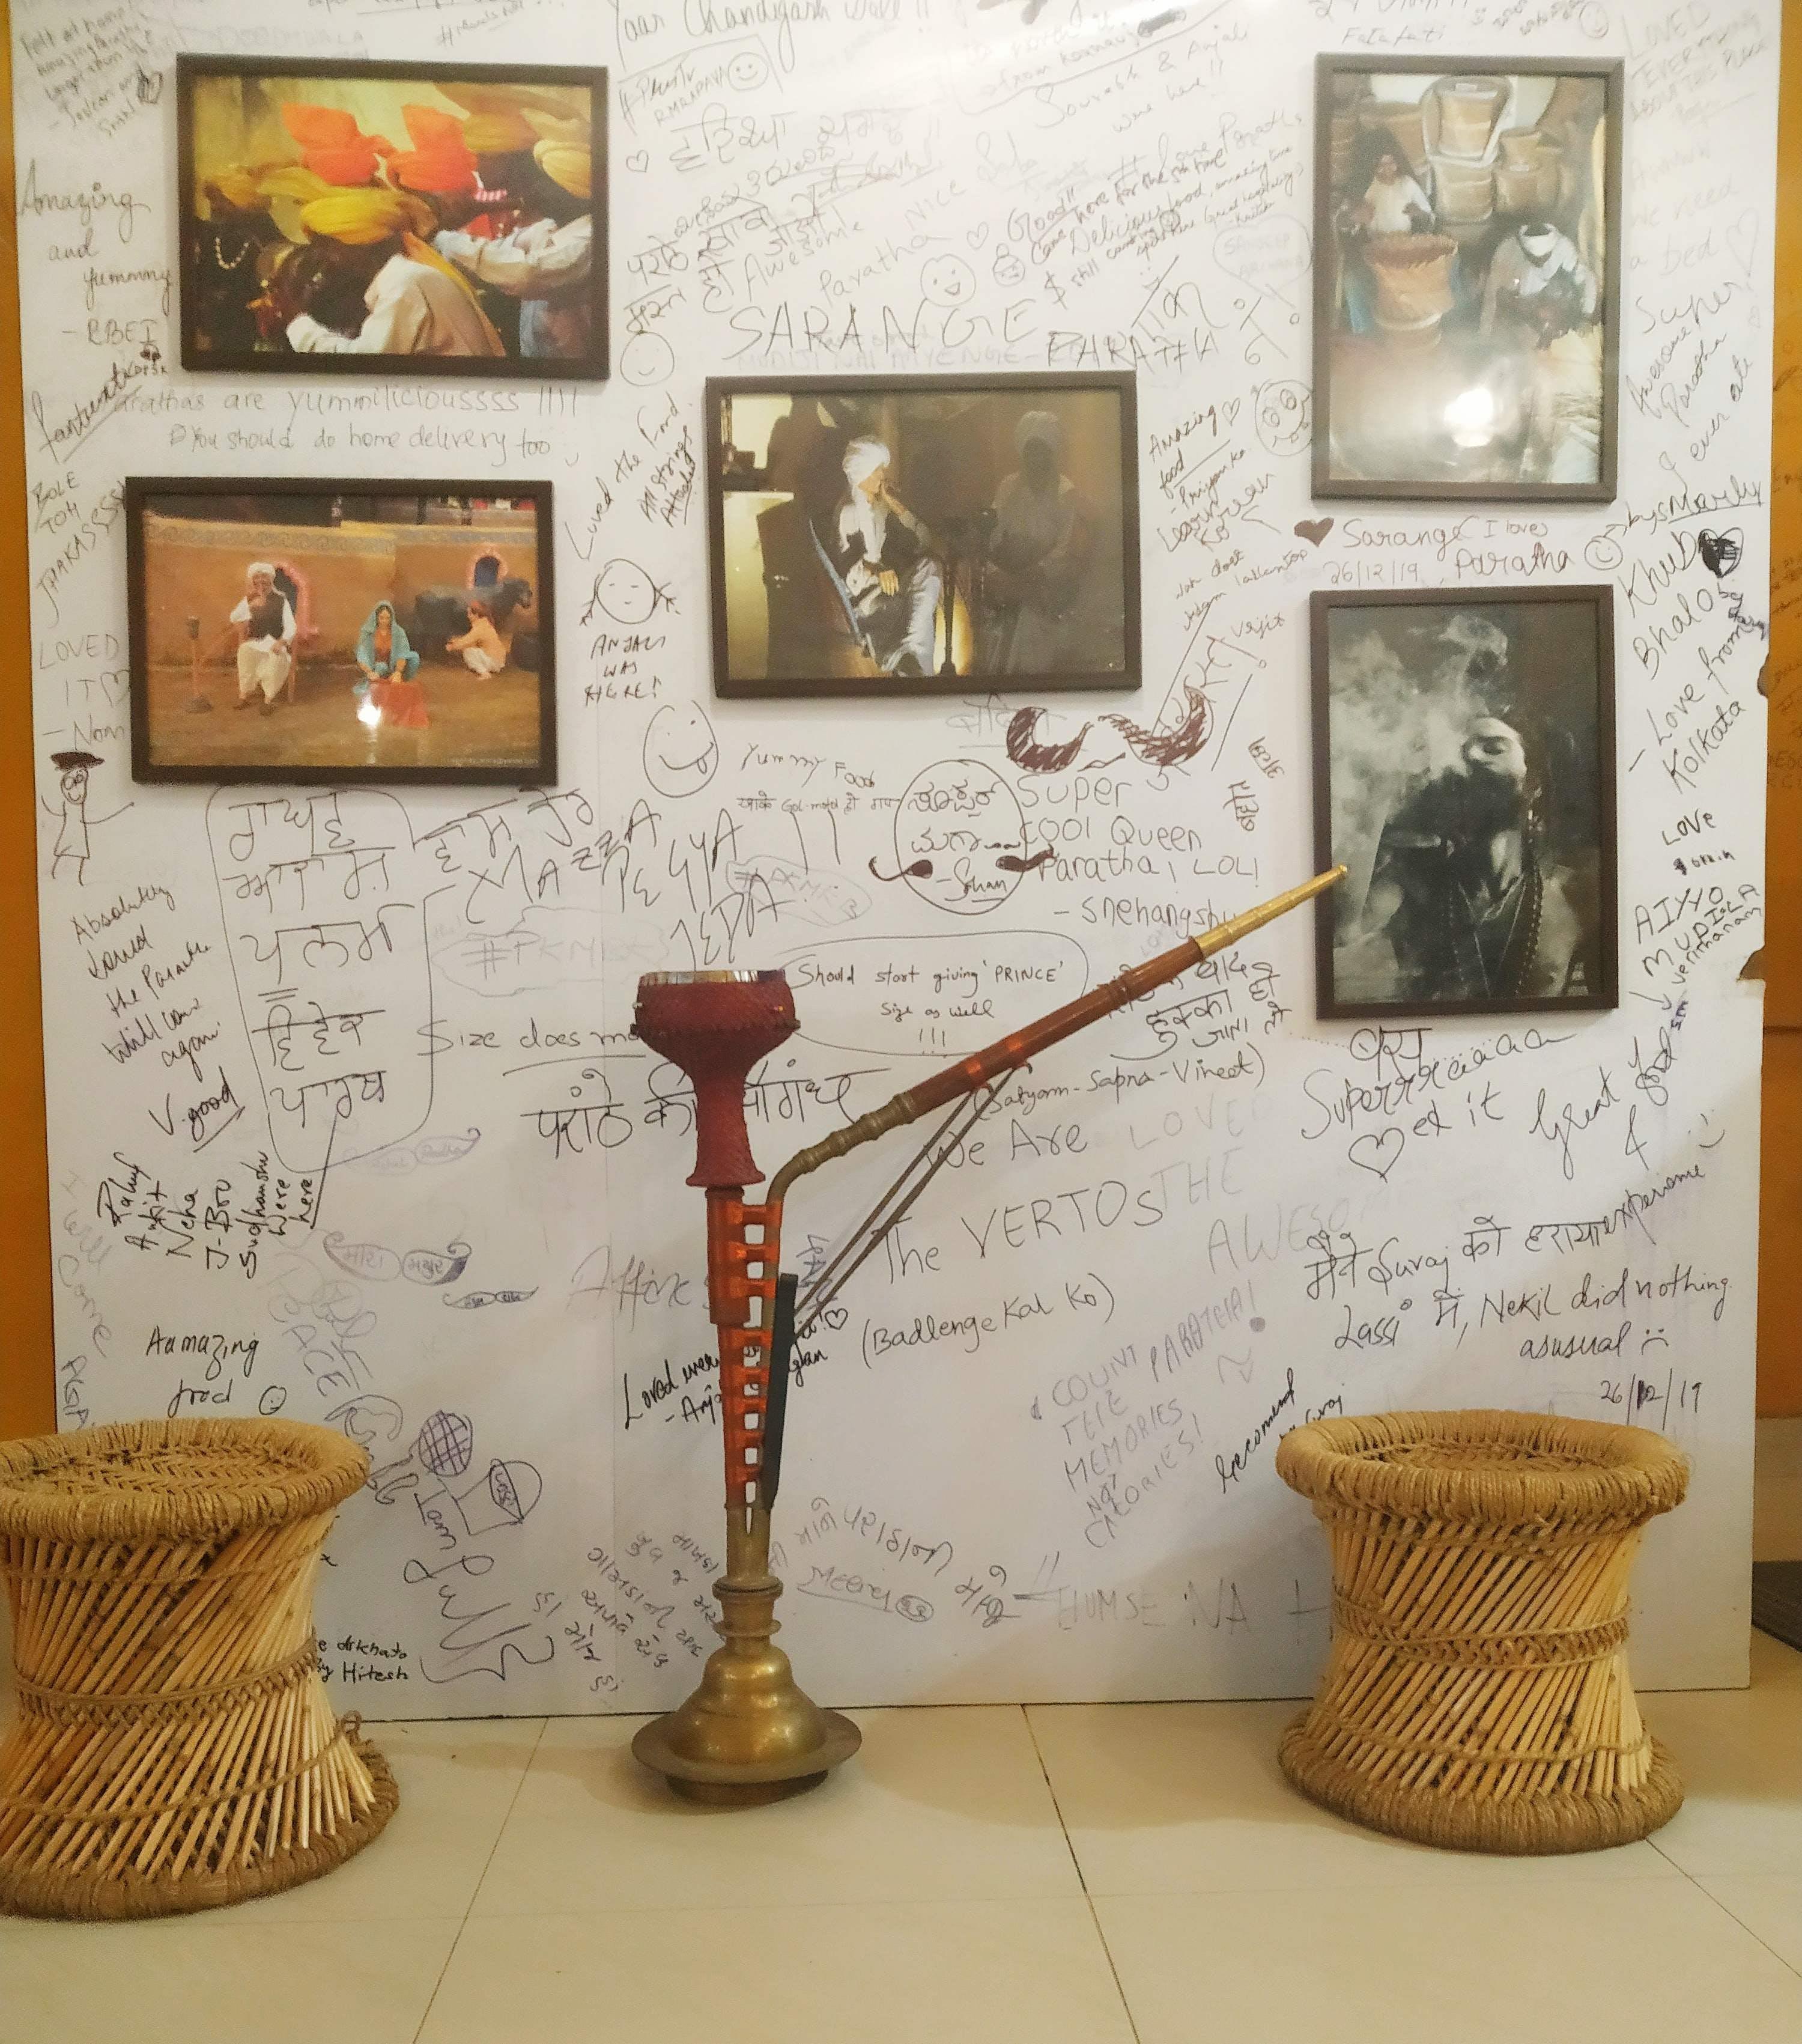 Wall,Floor,Room,Interior design,Art,Table,Tile,Flooring,Furniture,Modern art